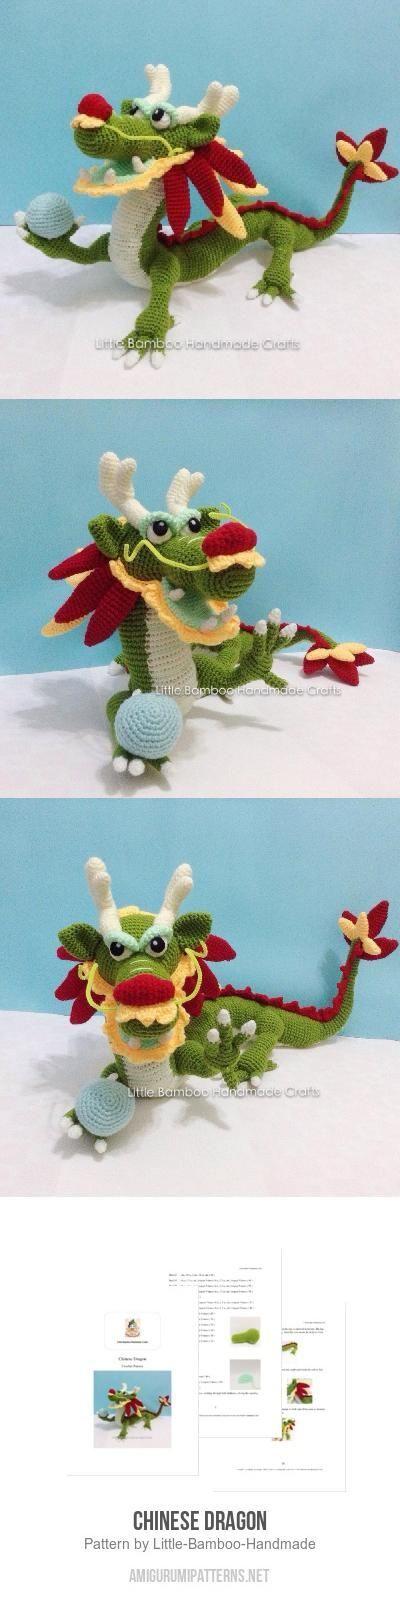 Chinese Dragon Amigurumi Pattern $7.50